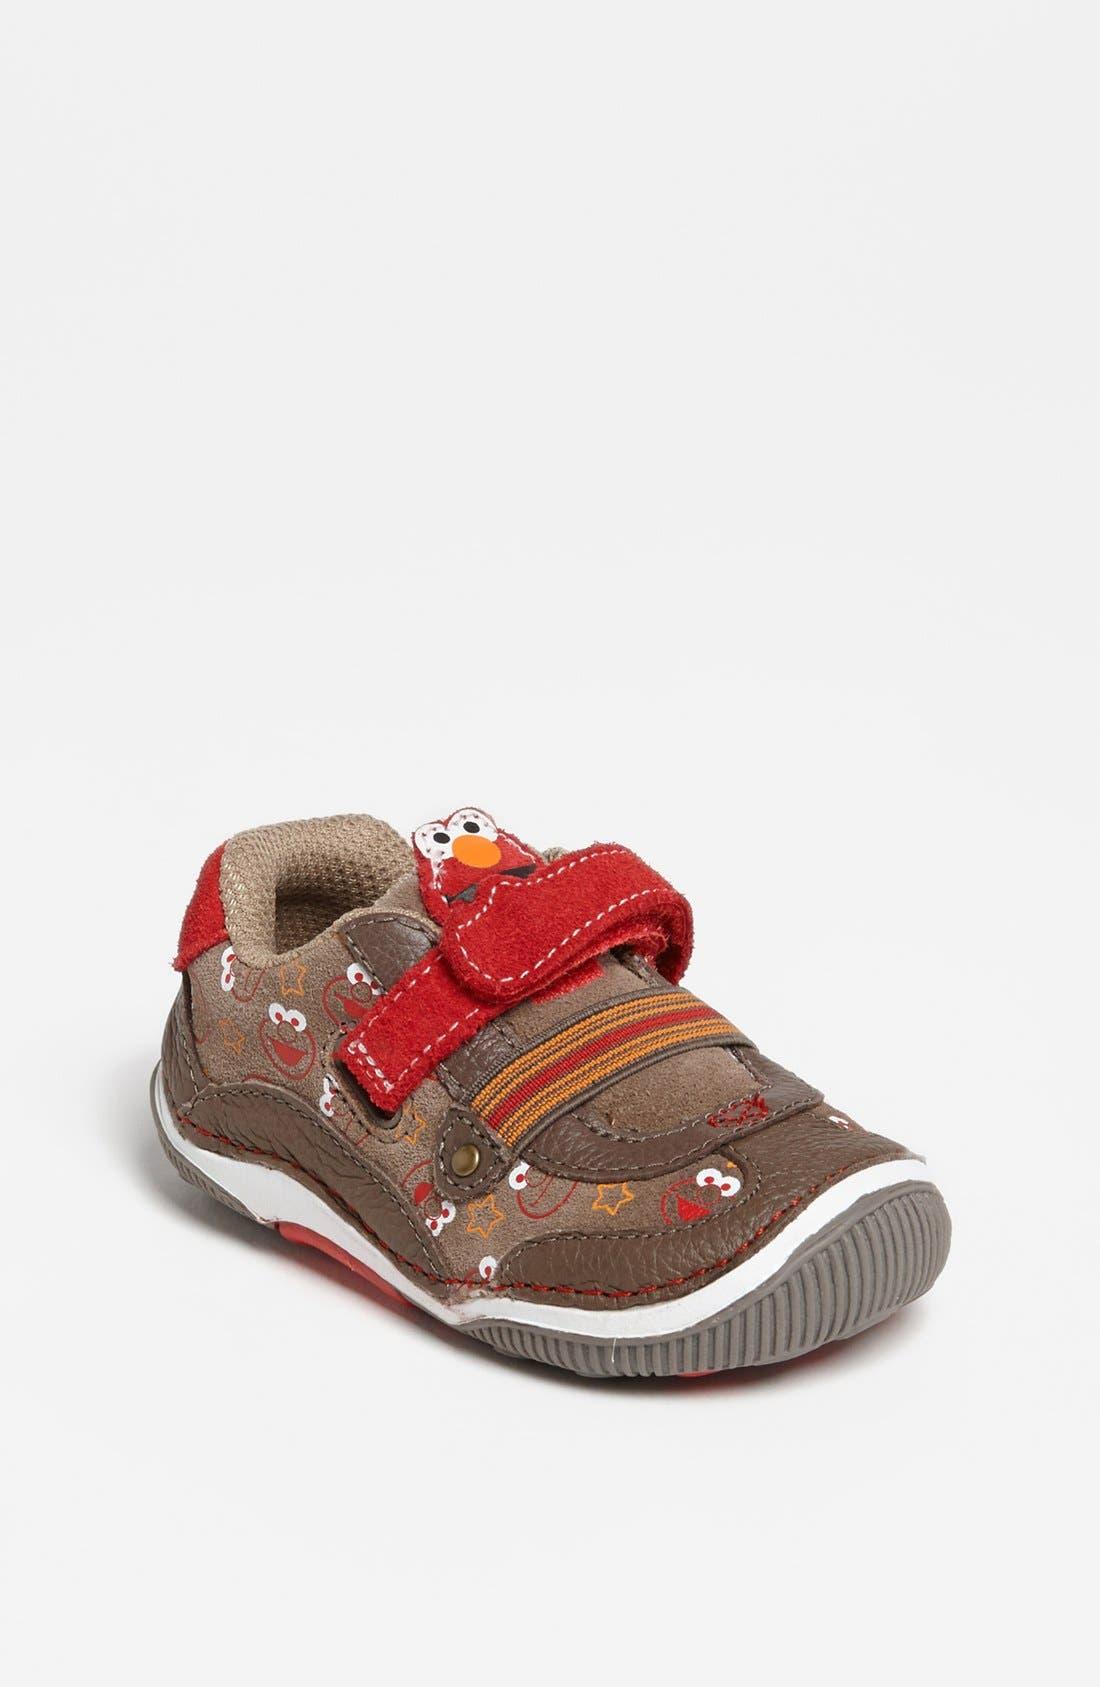 Alternate Image 1 Selected - Stride Rite ' Embracers™ - Elmo™' Sneaker (Baby, Walker & Toddler)